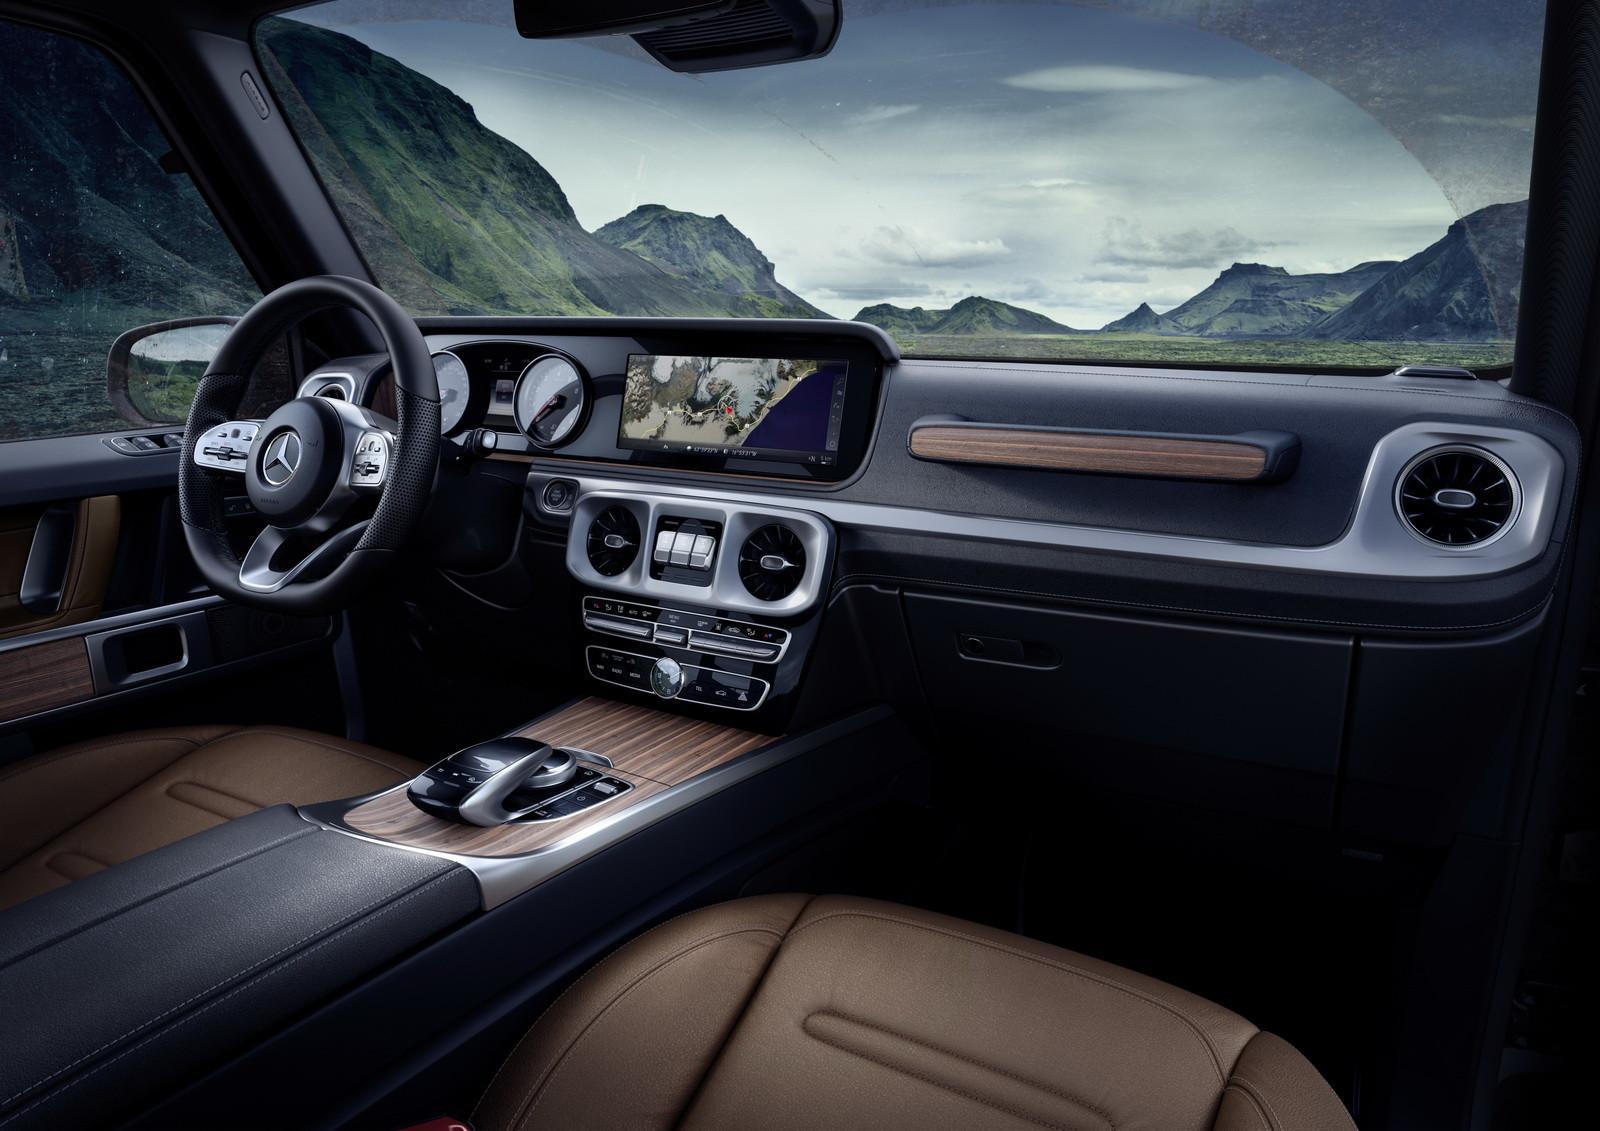 Foto de Mercedes-Benz Clase G 2018, imágenes filtradas (6/24)